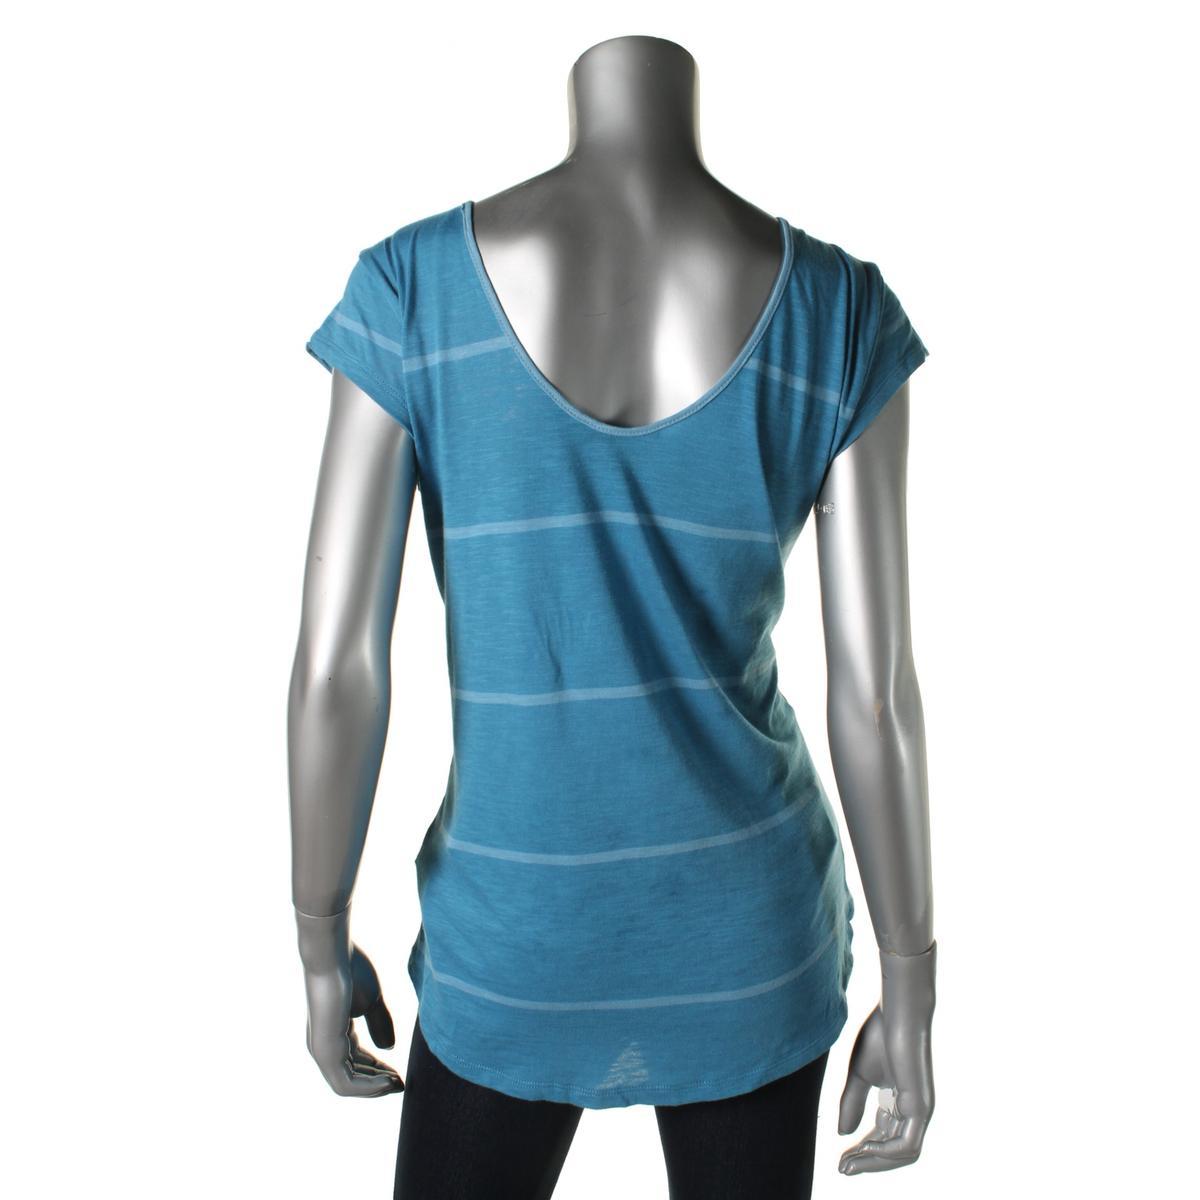 calvin klein jeans 4254 womens modal blend pullover top. Black Bedroom Furniture Sets. Home Design Ideas